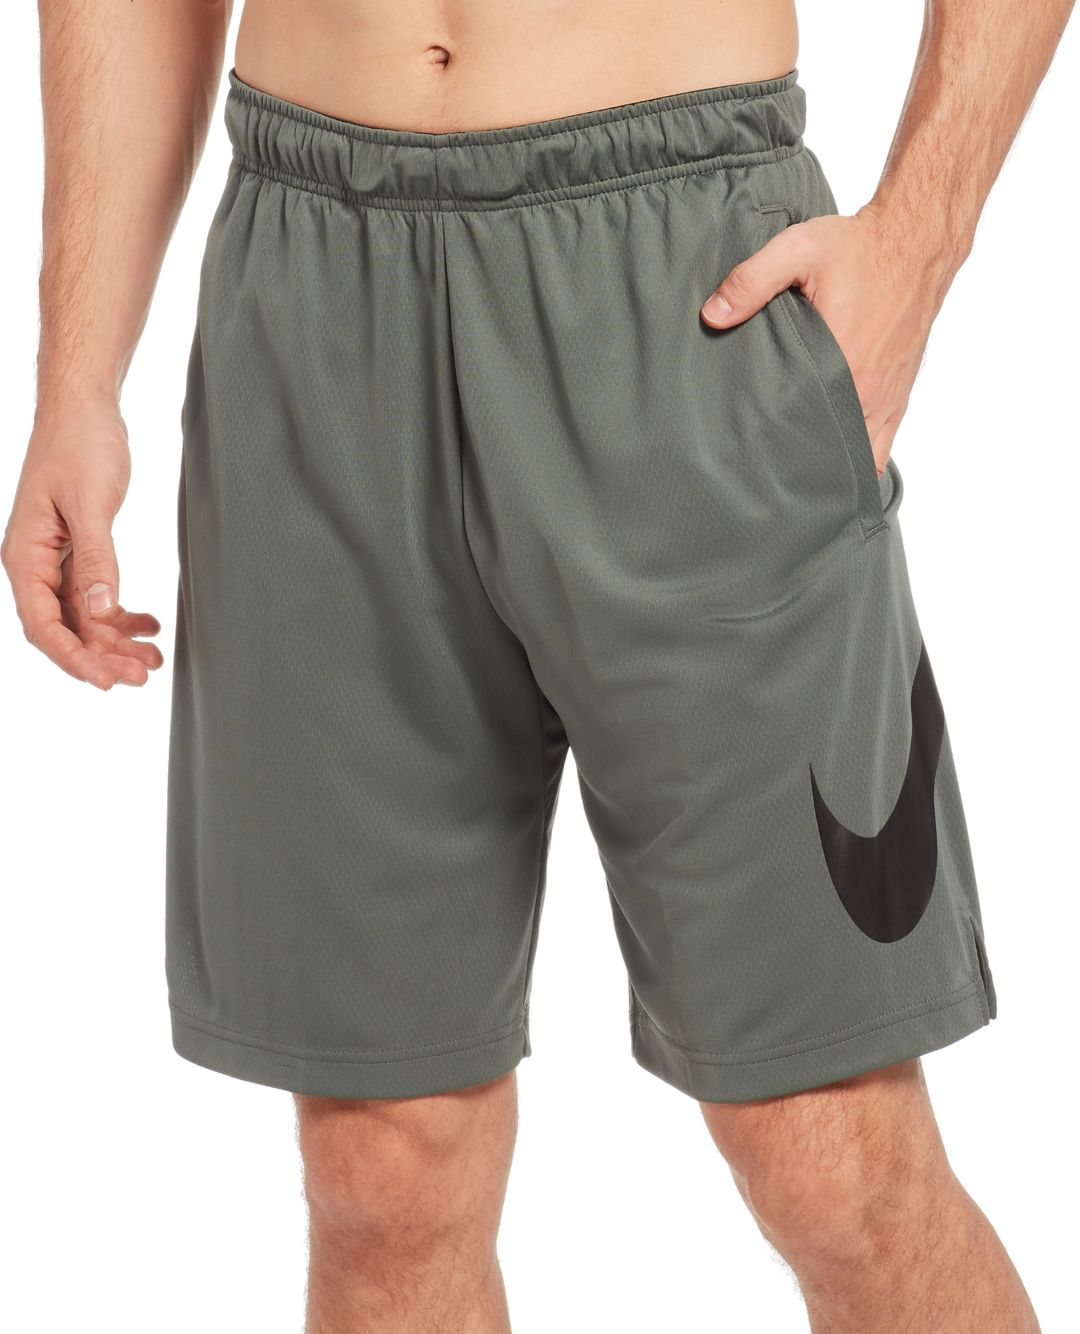 4545274bfa231 Nike Men's Dry HBR 4.0 Training Shorts